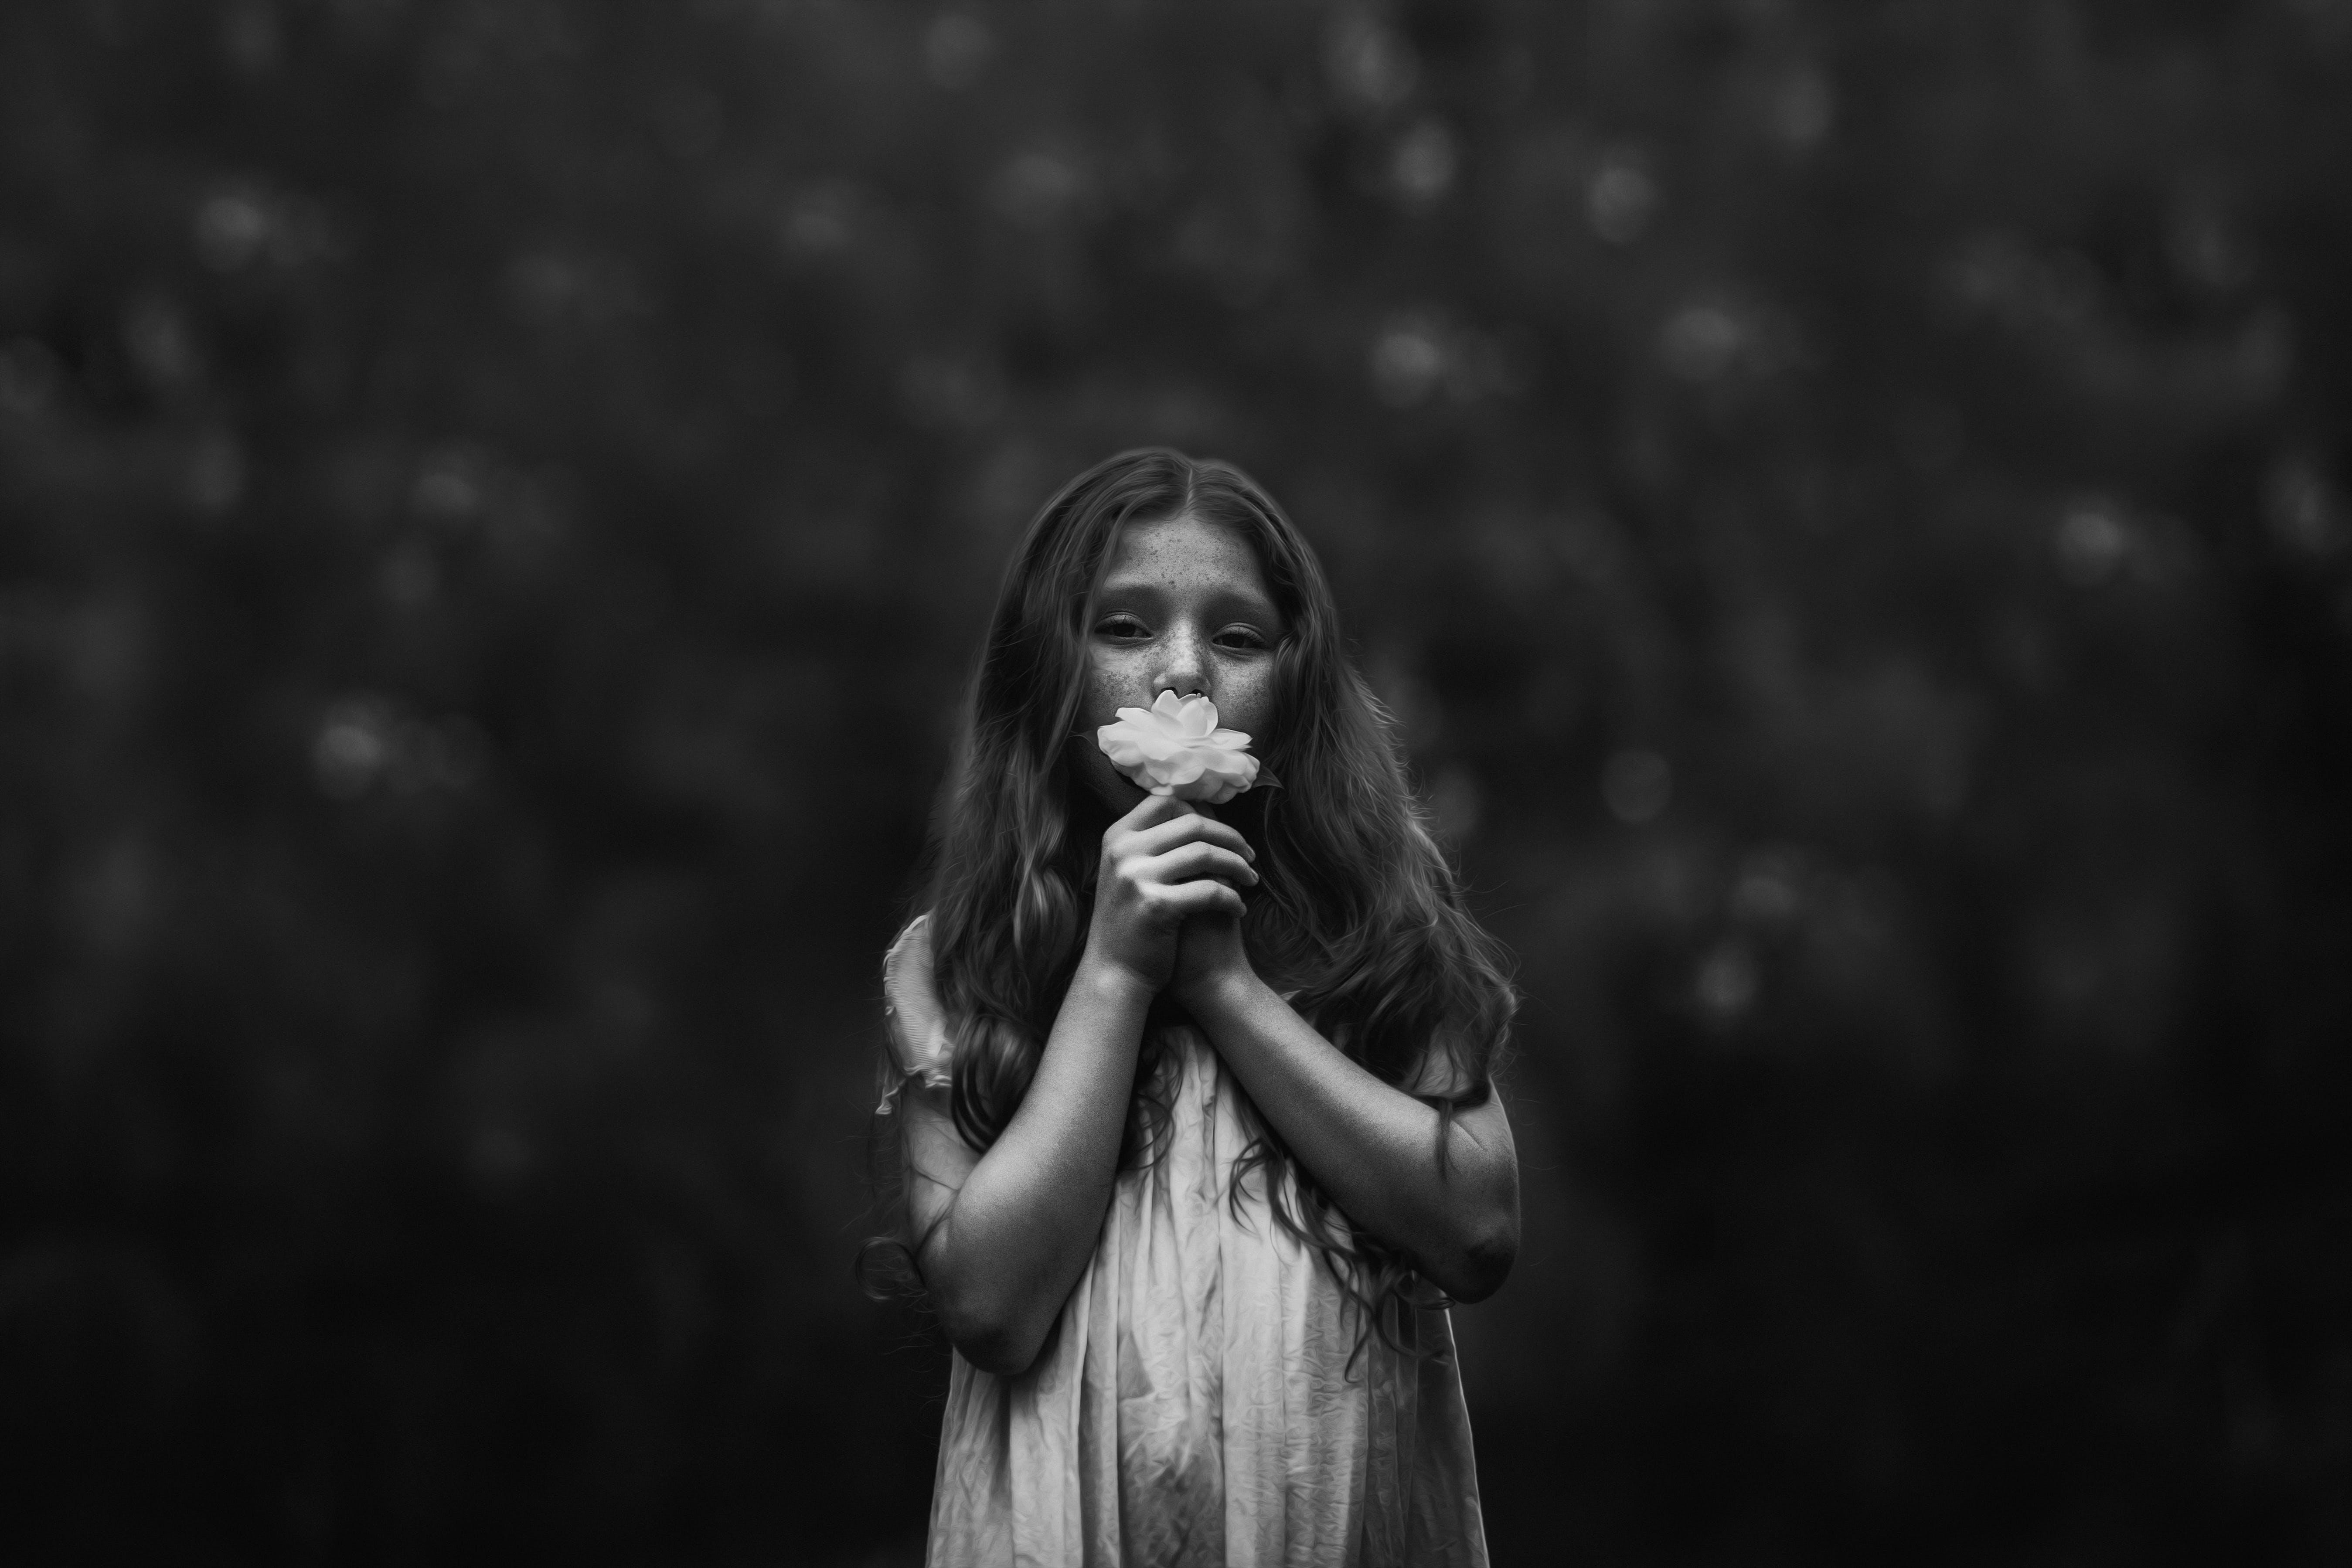 black-and-white, blur, child